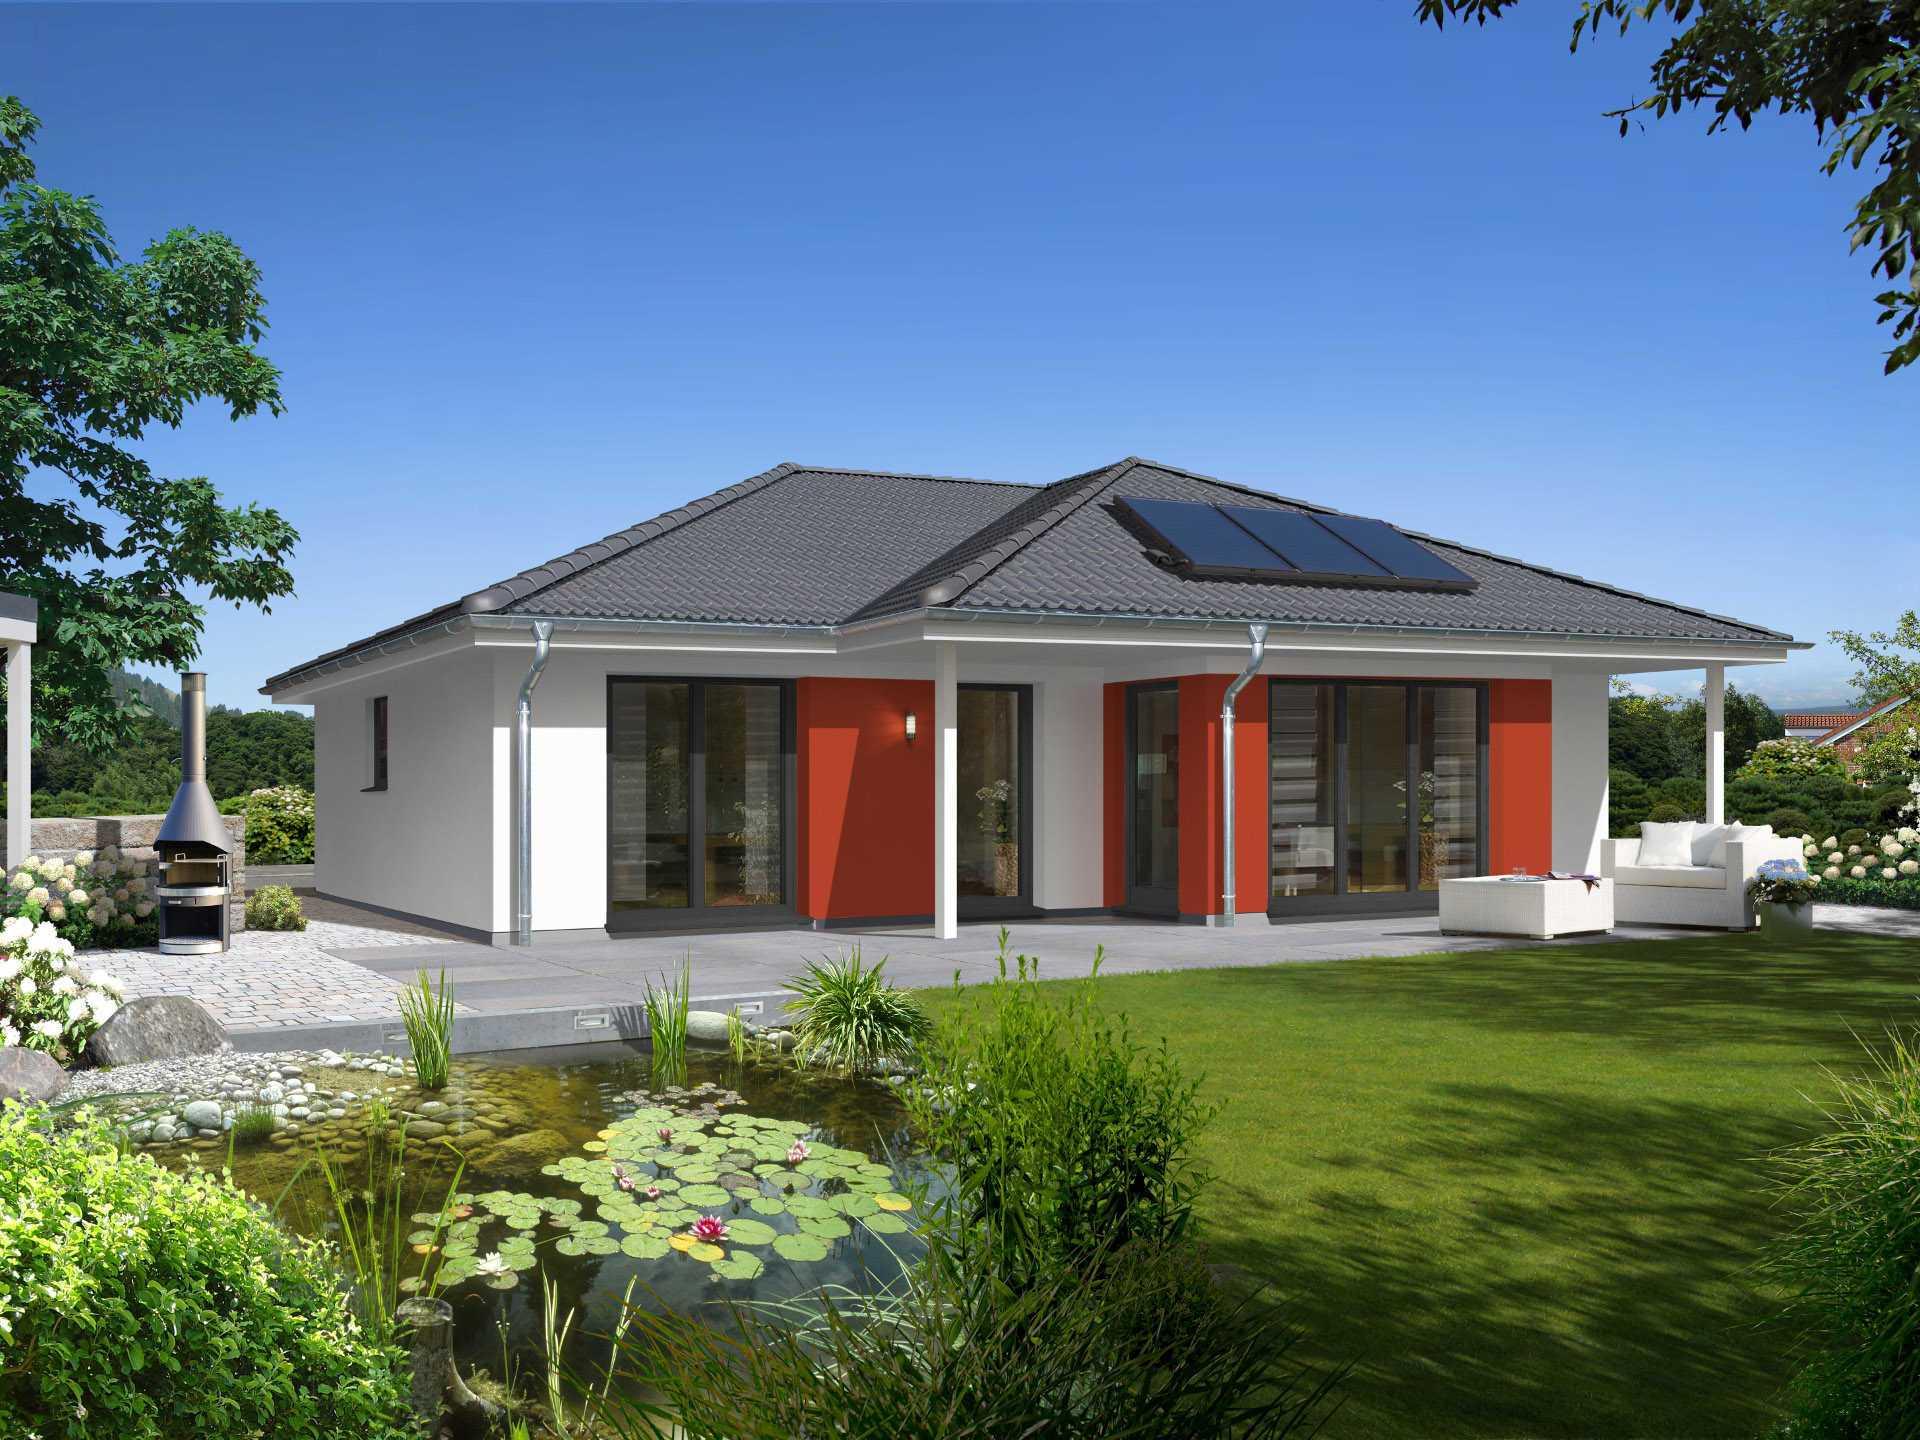 Bungalow 128 town country haus for Haus mit doppelgarage bauen